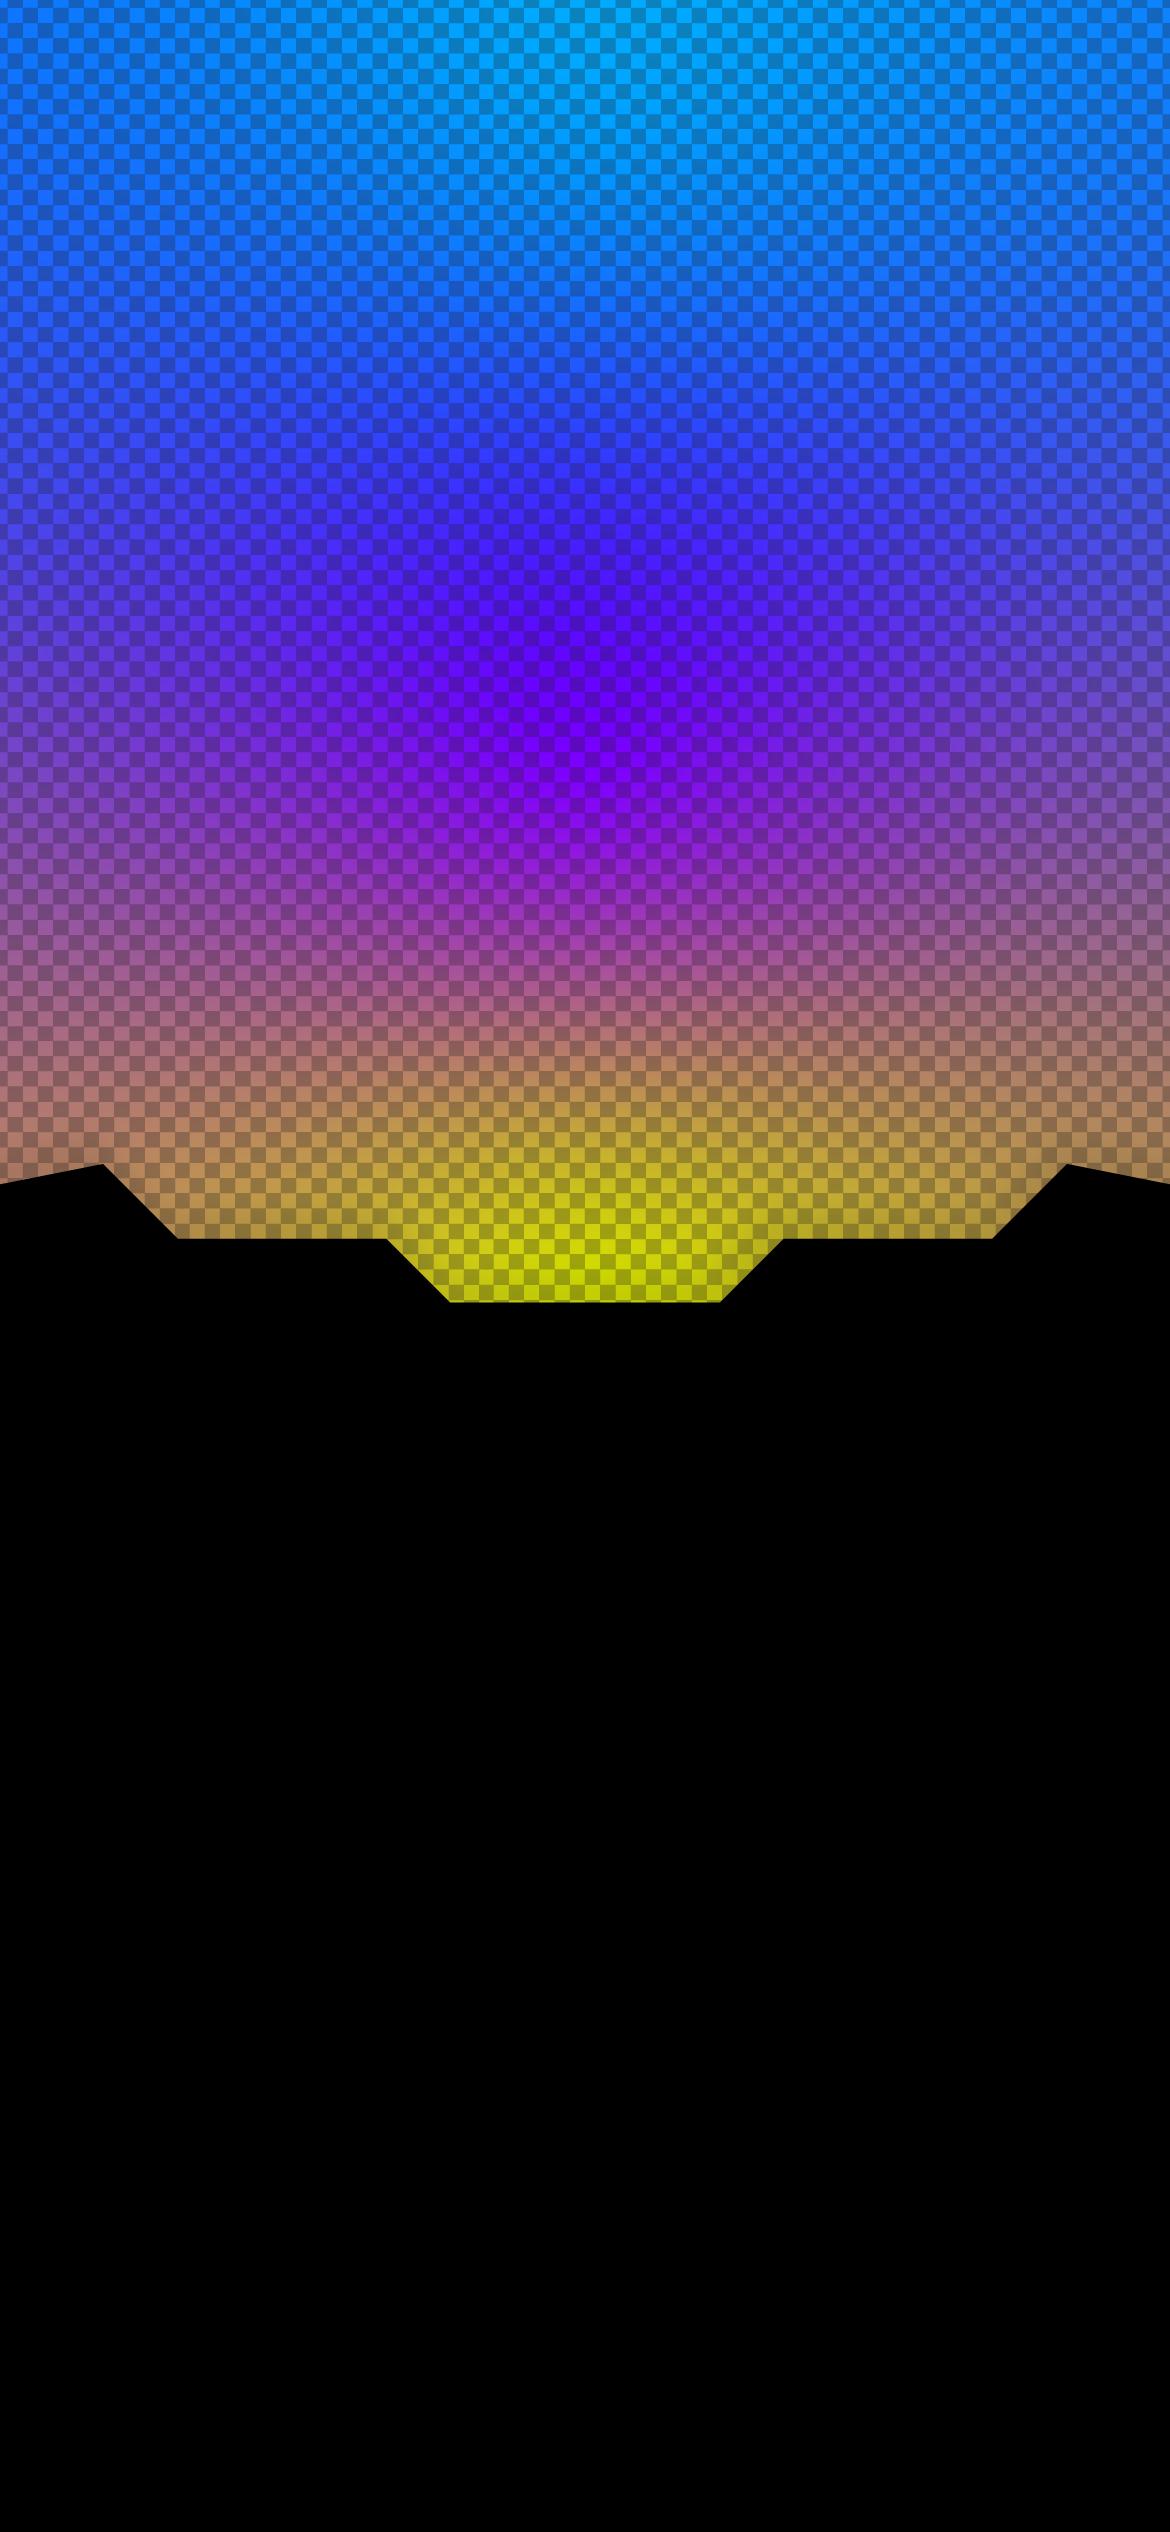 iphone 12 wallpaper gradient oled resolution original